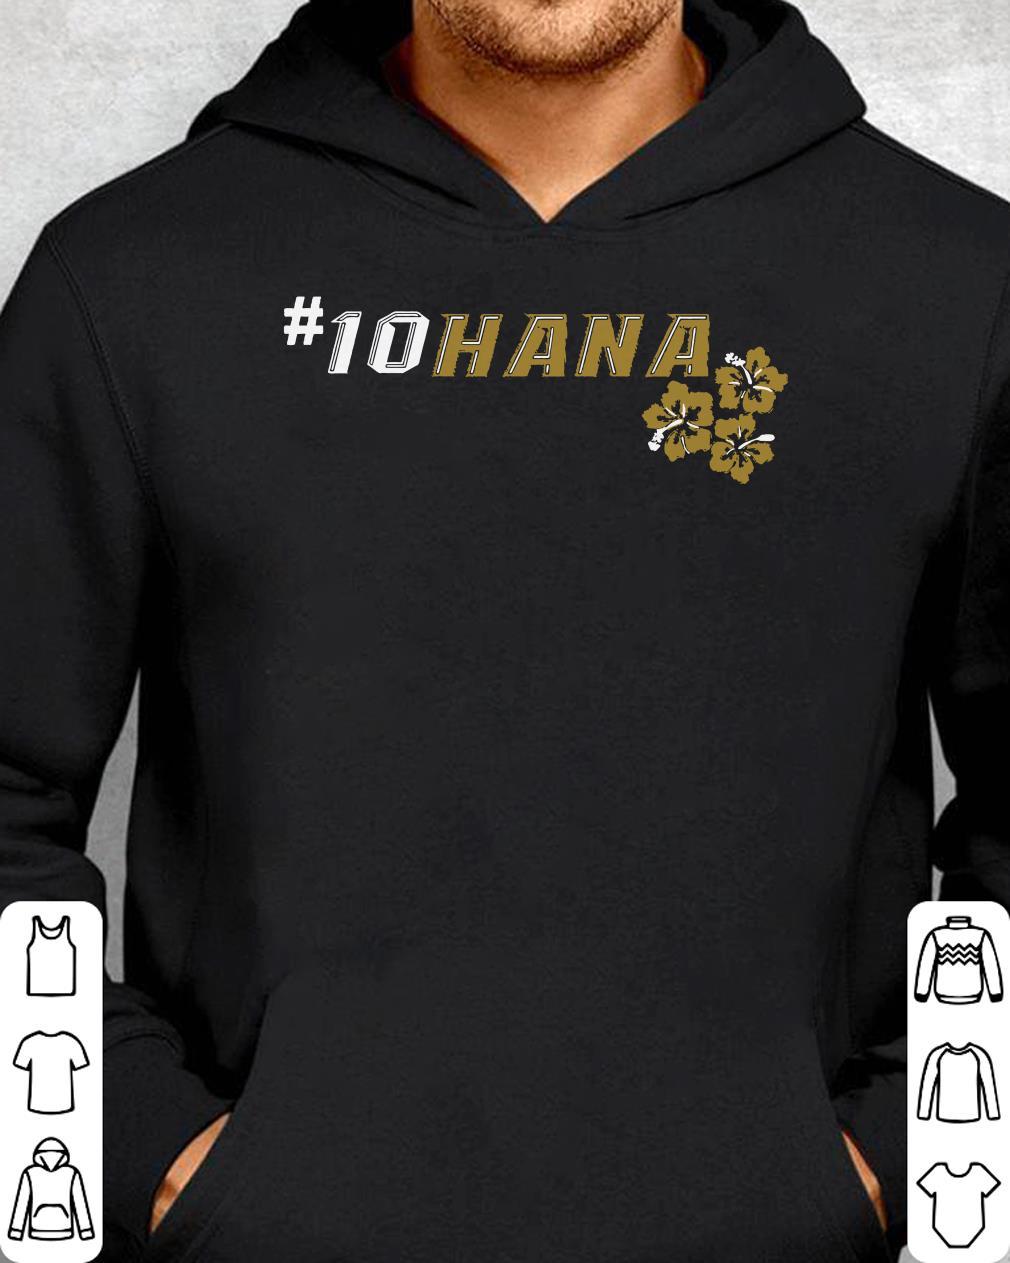 cheap for discount e34c5 2cbf5 Awesome UCF Knights 10HANA shirt